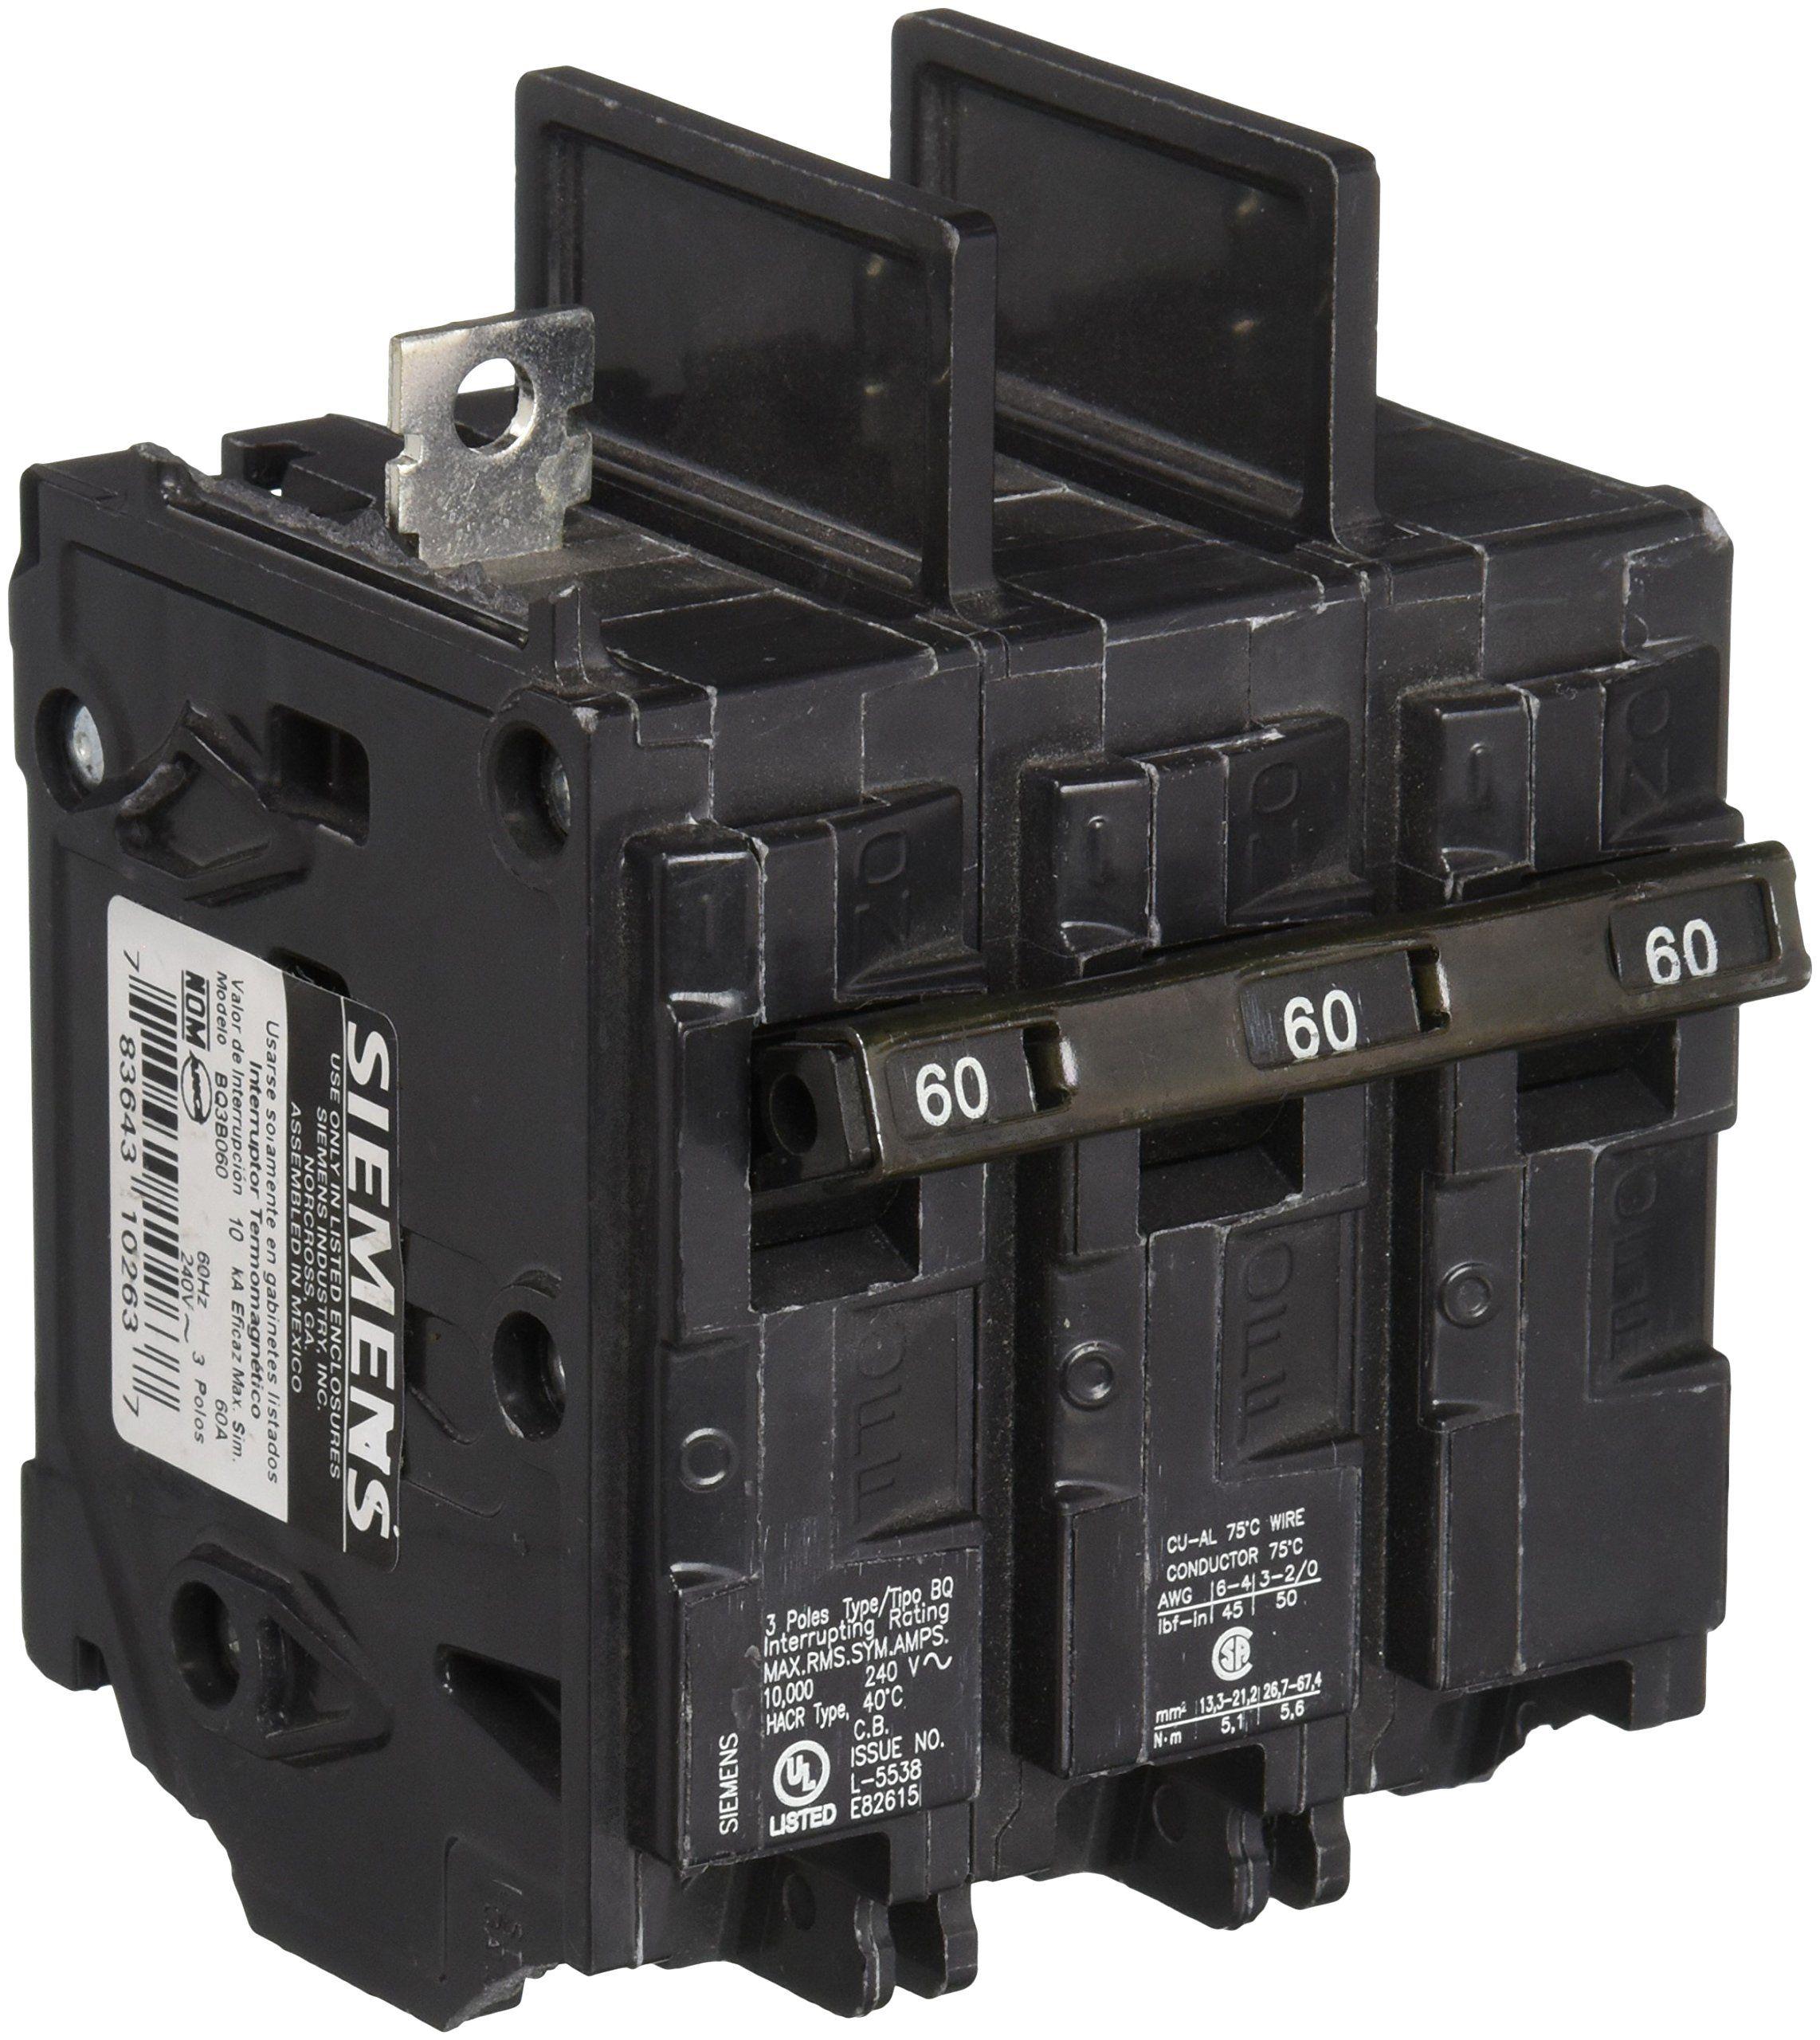 15 Amp 3//4 in Single-Pole Zinsco Type Q Replacement Circuit Breaker